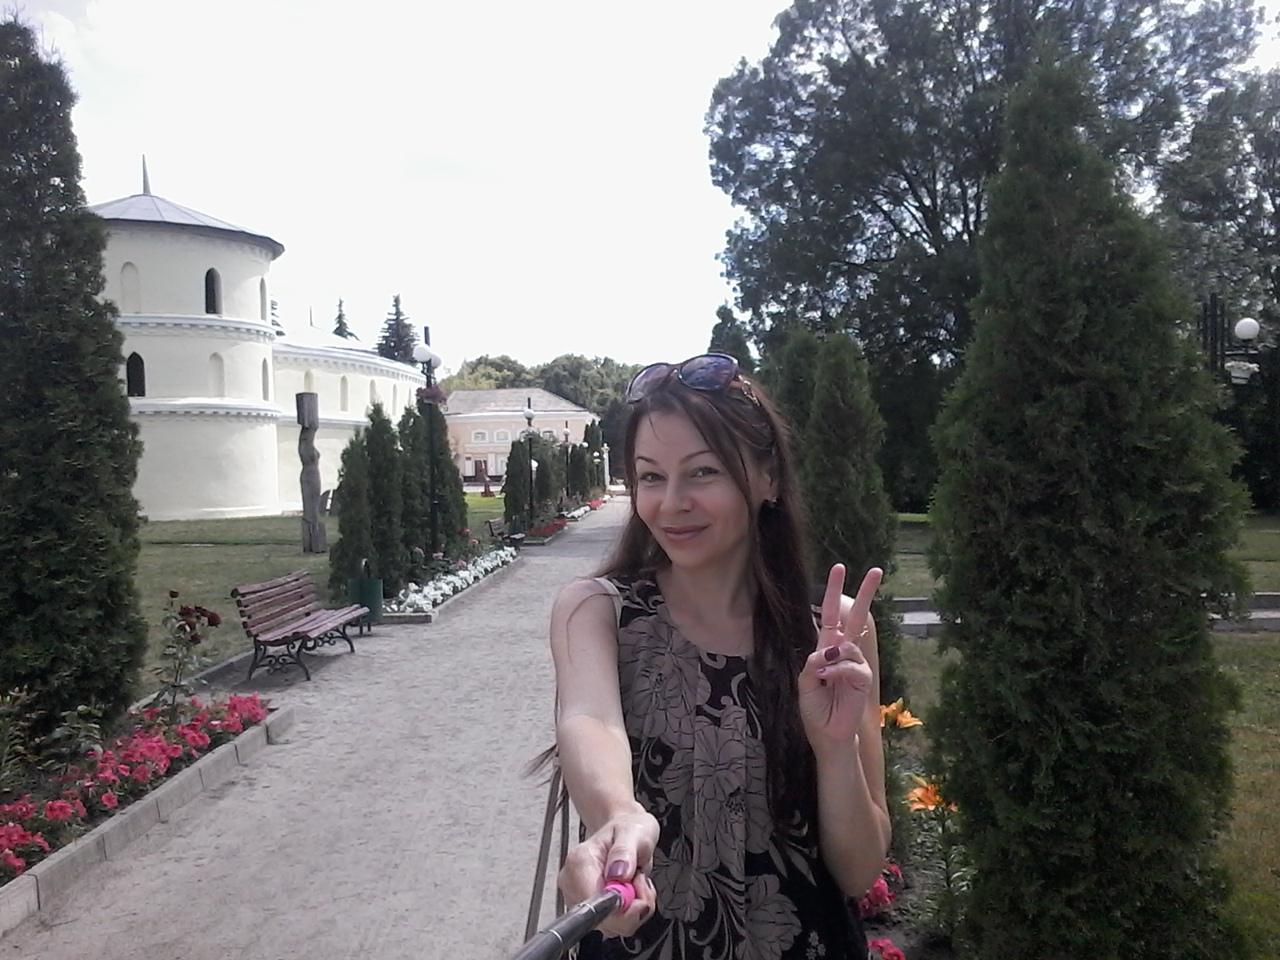 Яна Мосьпан, Санкт-Петербург - фото №2